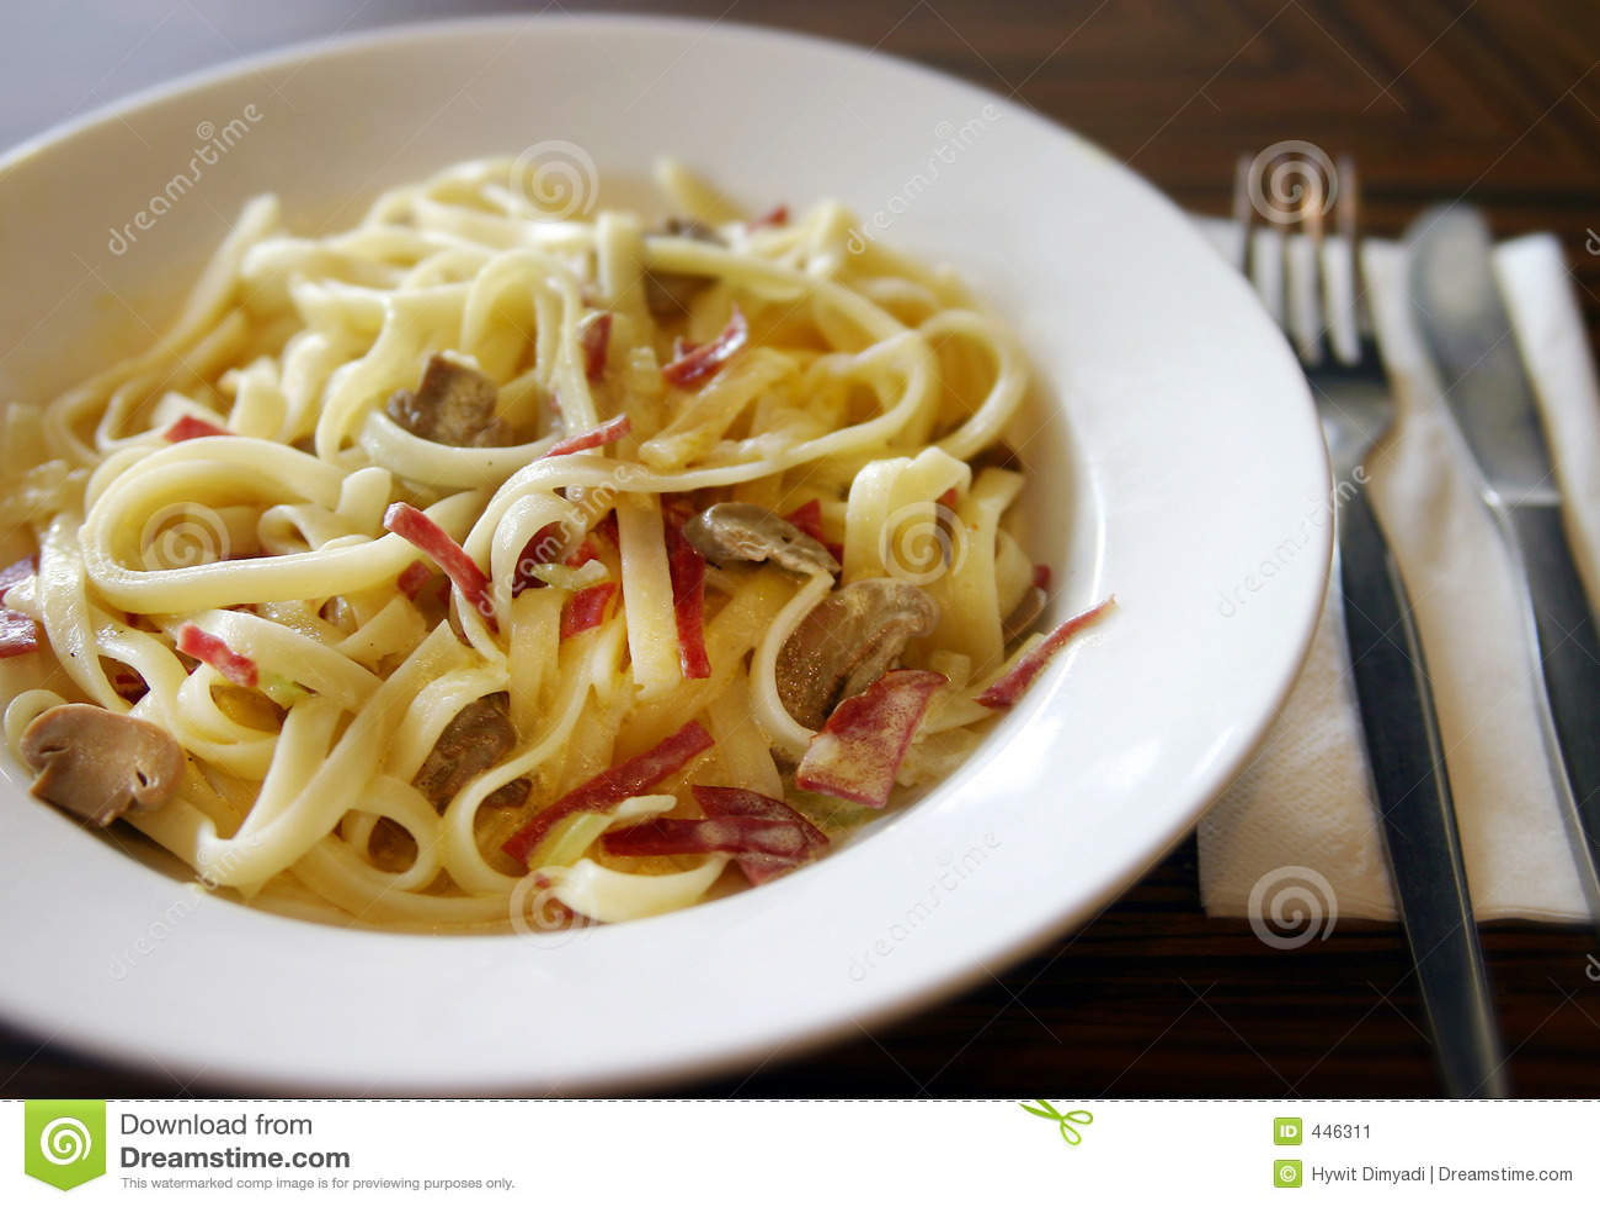 Yummy Fettuccine Dinner Stock Image - Image: 446311